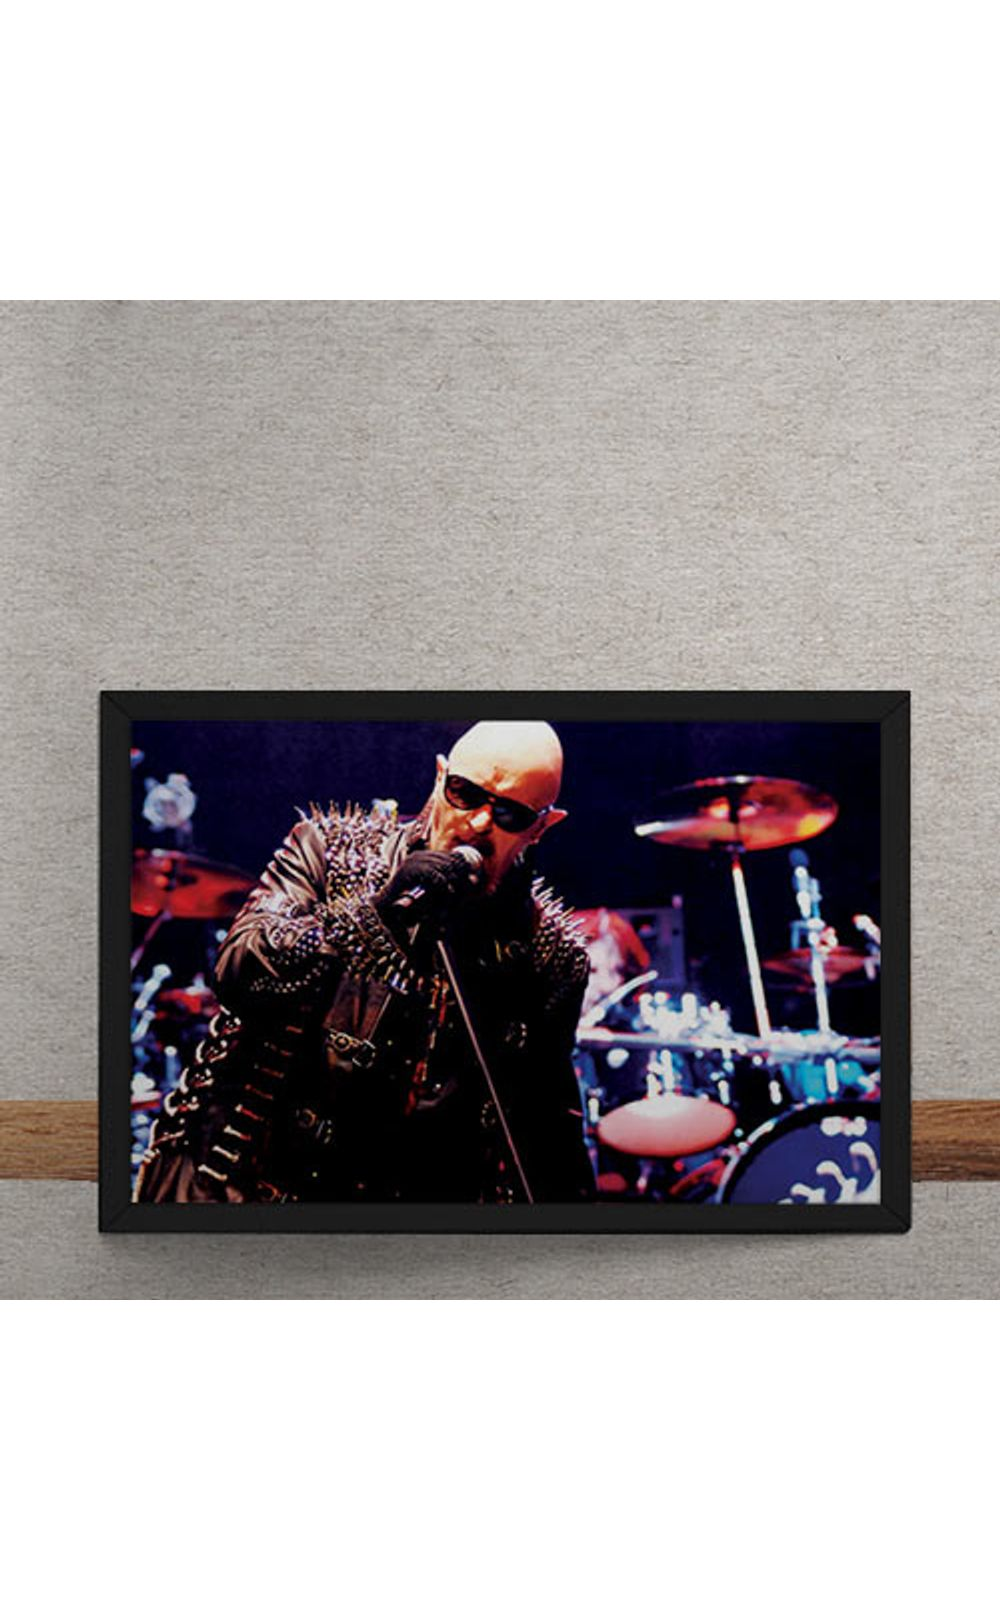 Foto 3 - Quadro Decorativo Judas Priest Rob Halford